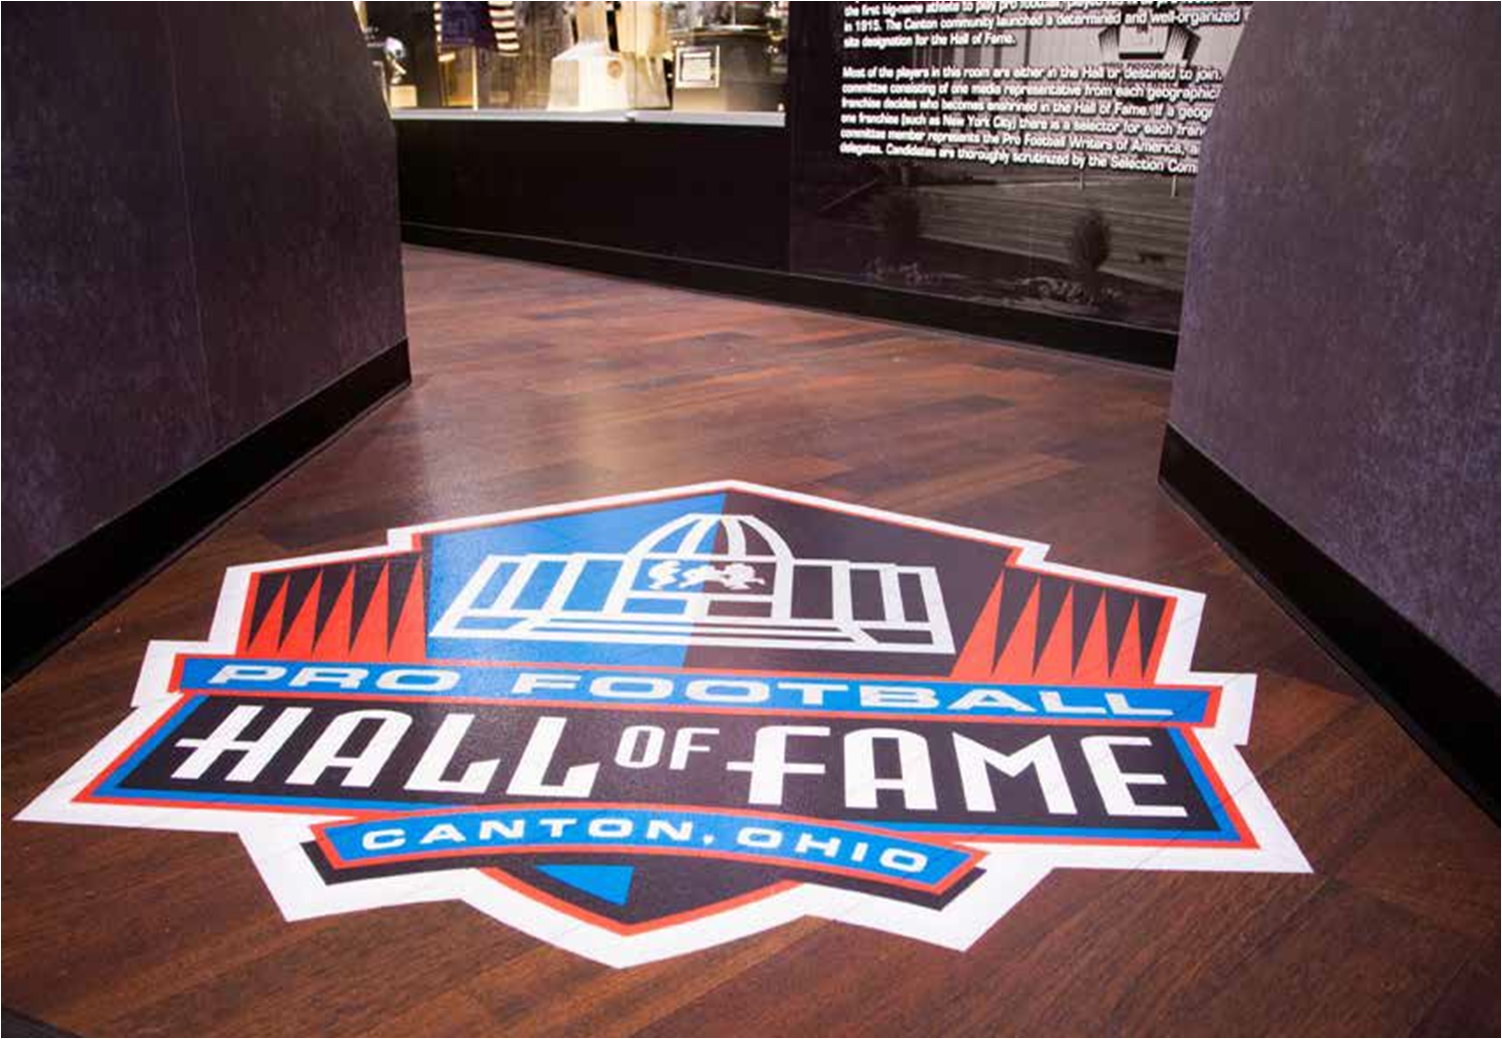 7-NFL-Hall-of-Fame-1.png